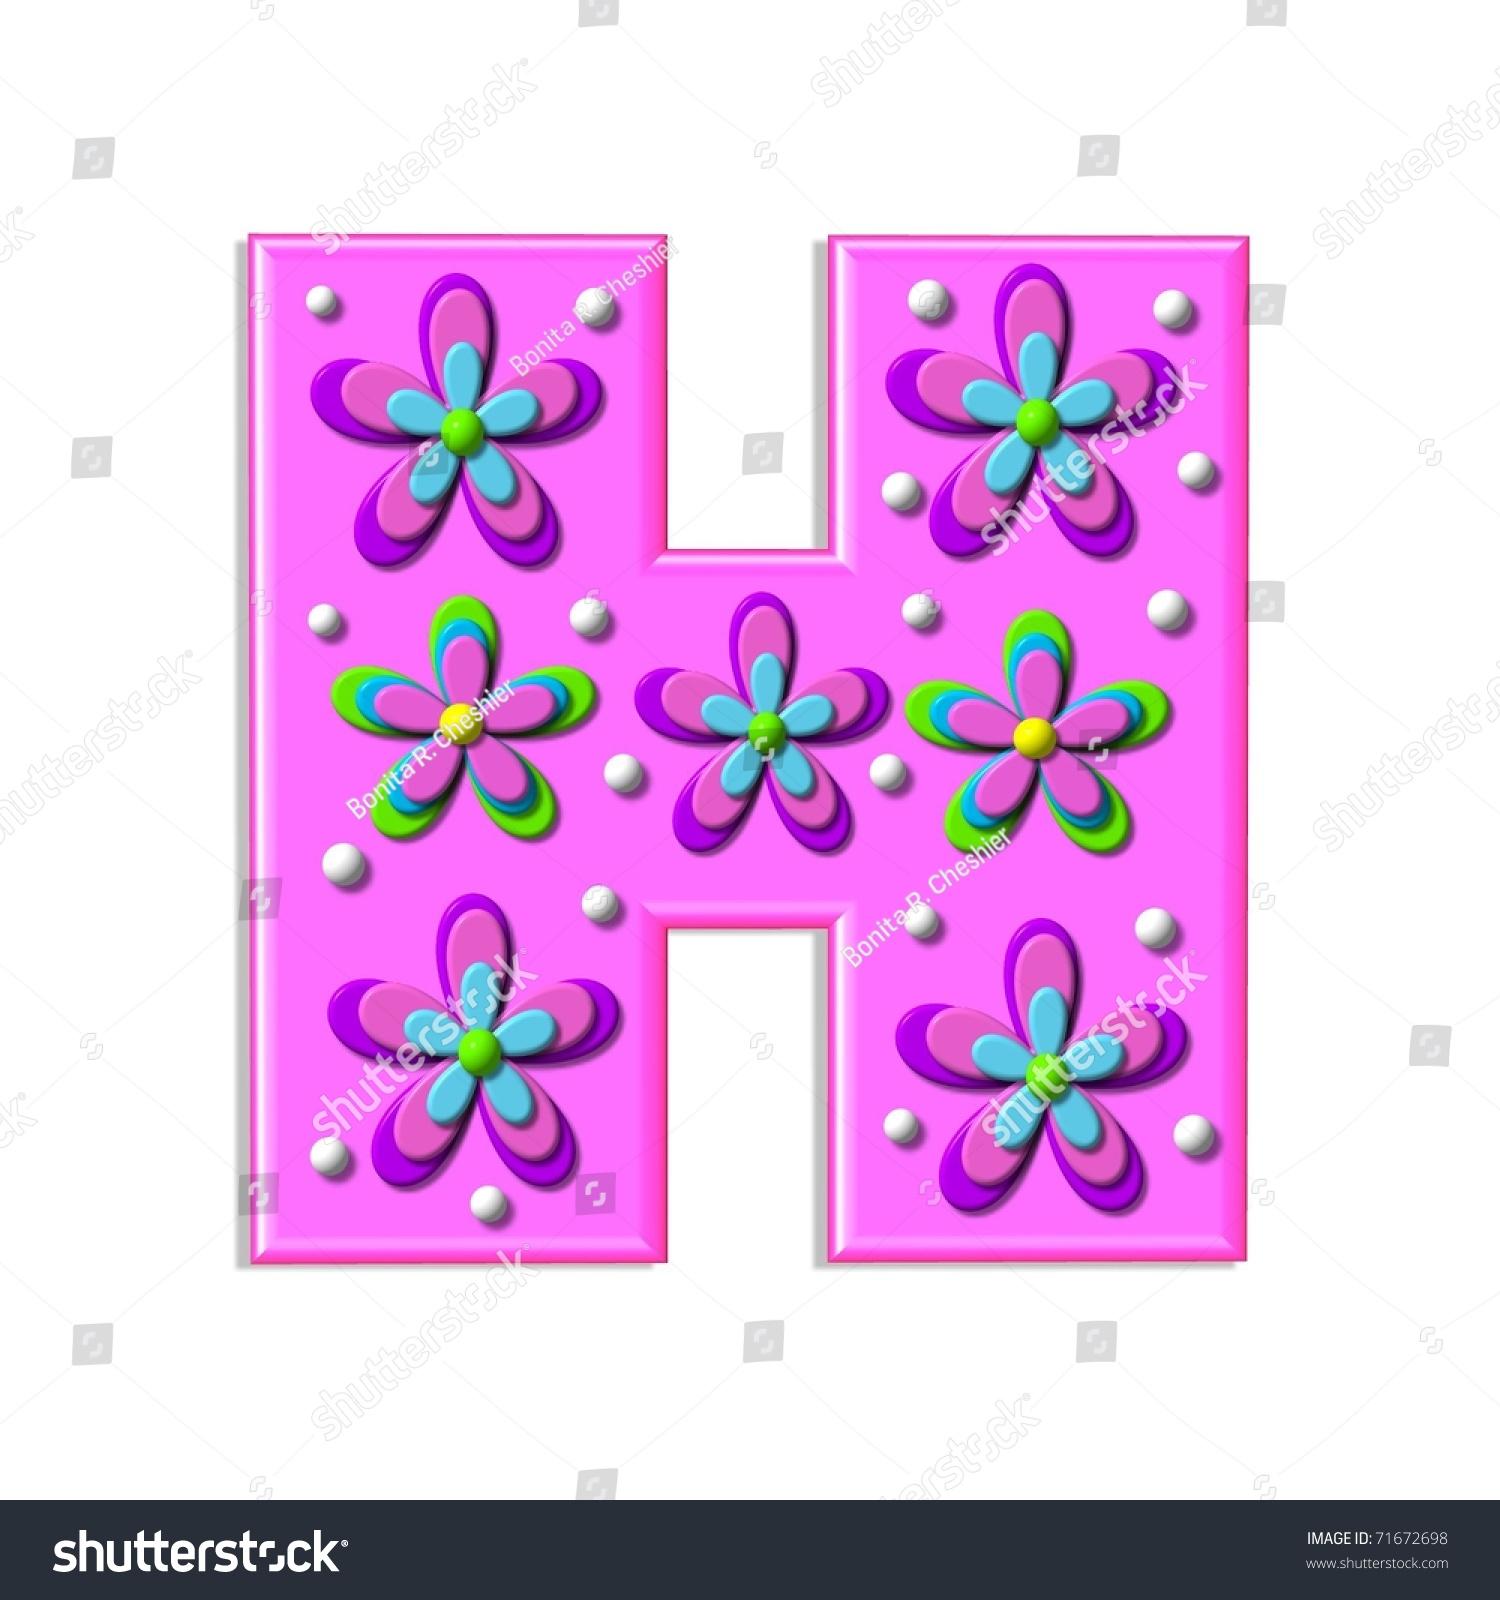 Funky Hot Pink Letter H Part Stock Illustration 71672698 - Shutterstock